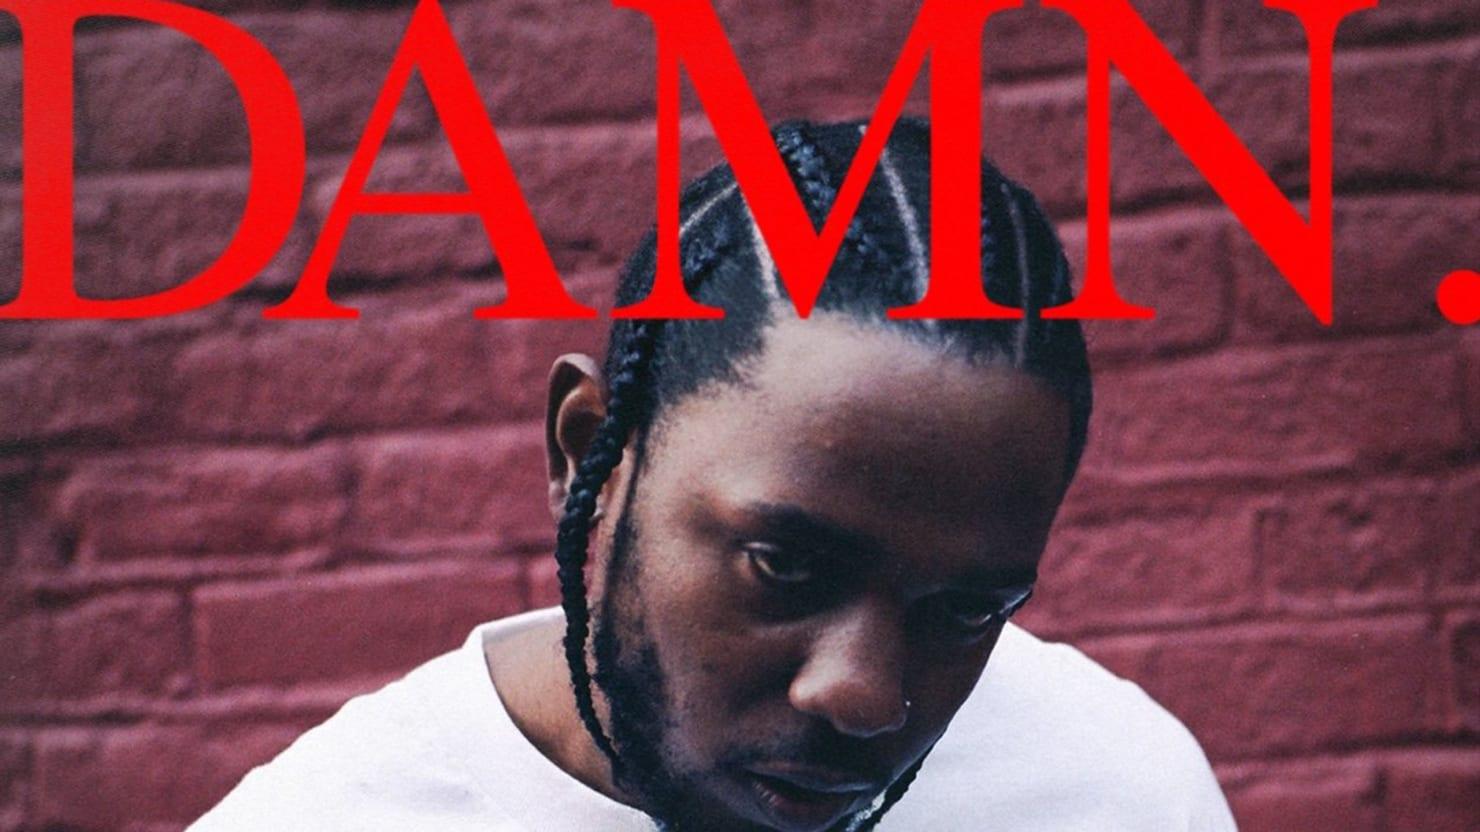 Kendrick Lamar Battles Trumpism, Fox News and Himself on New Album 'DAMN.'